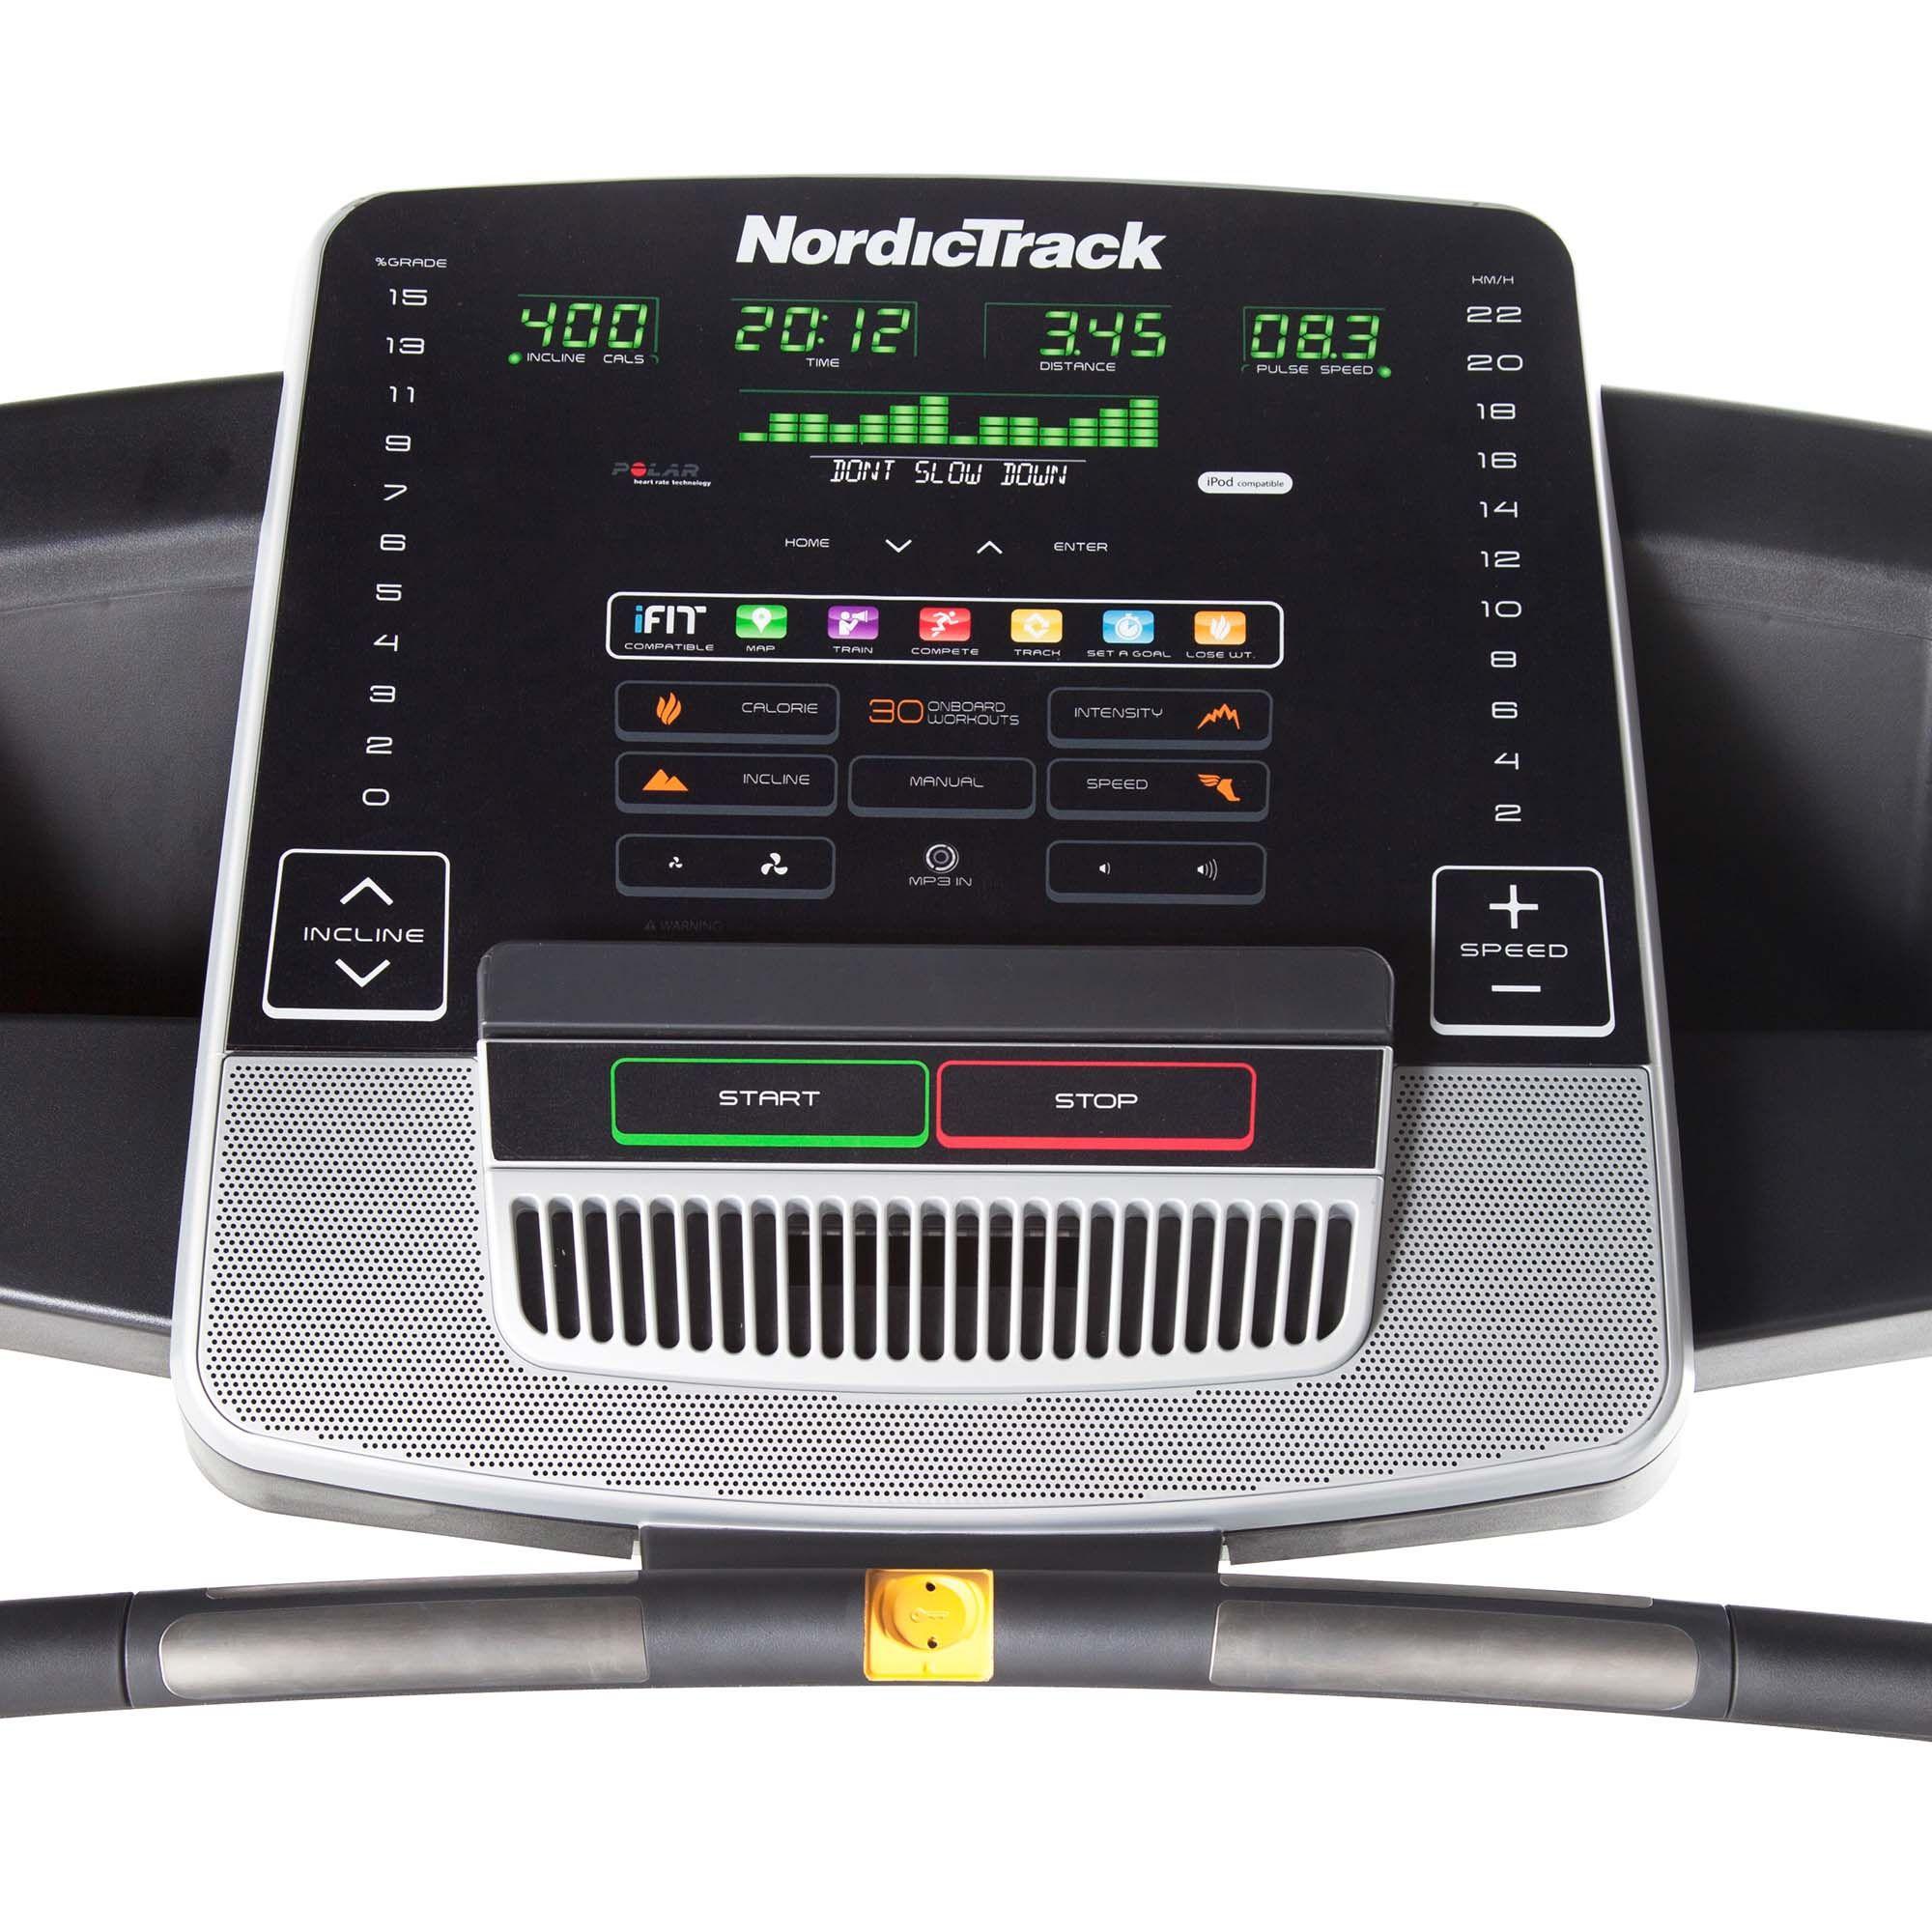 Nordictrack T14 Treadmill: NordicTrack T14.2 Treadmill